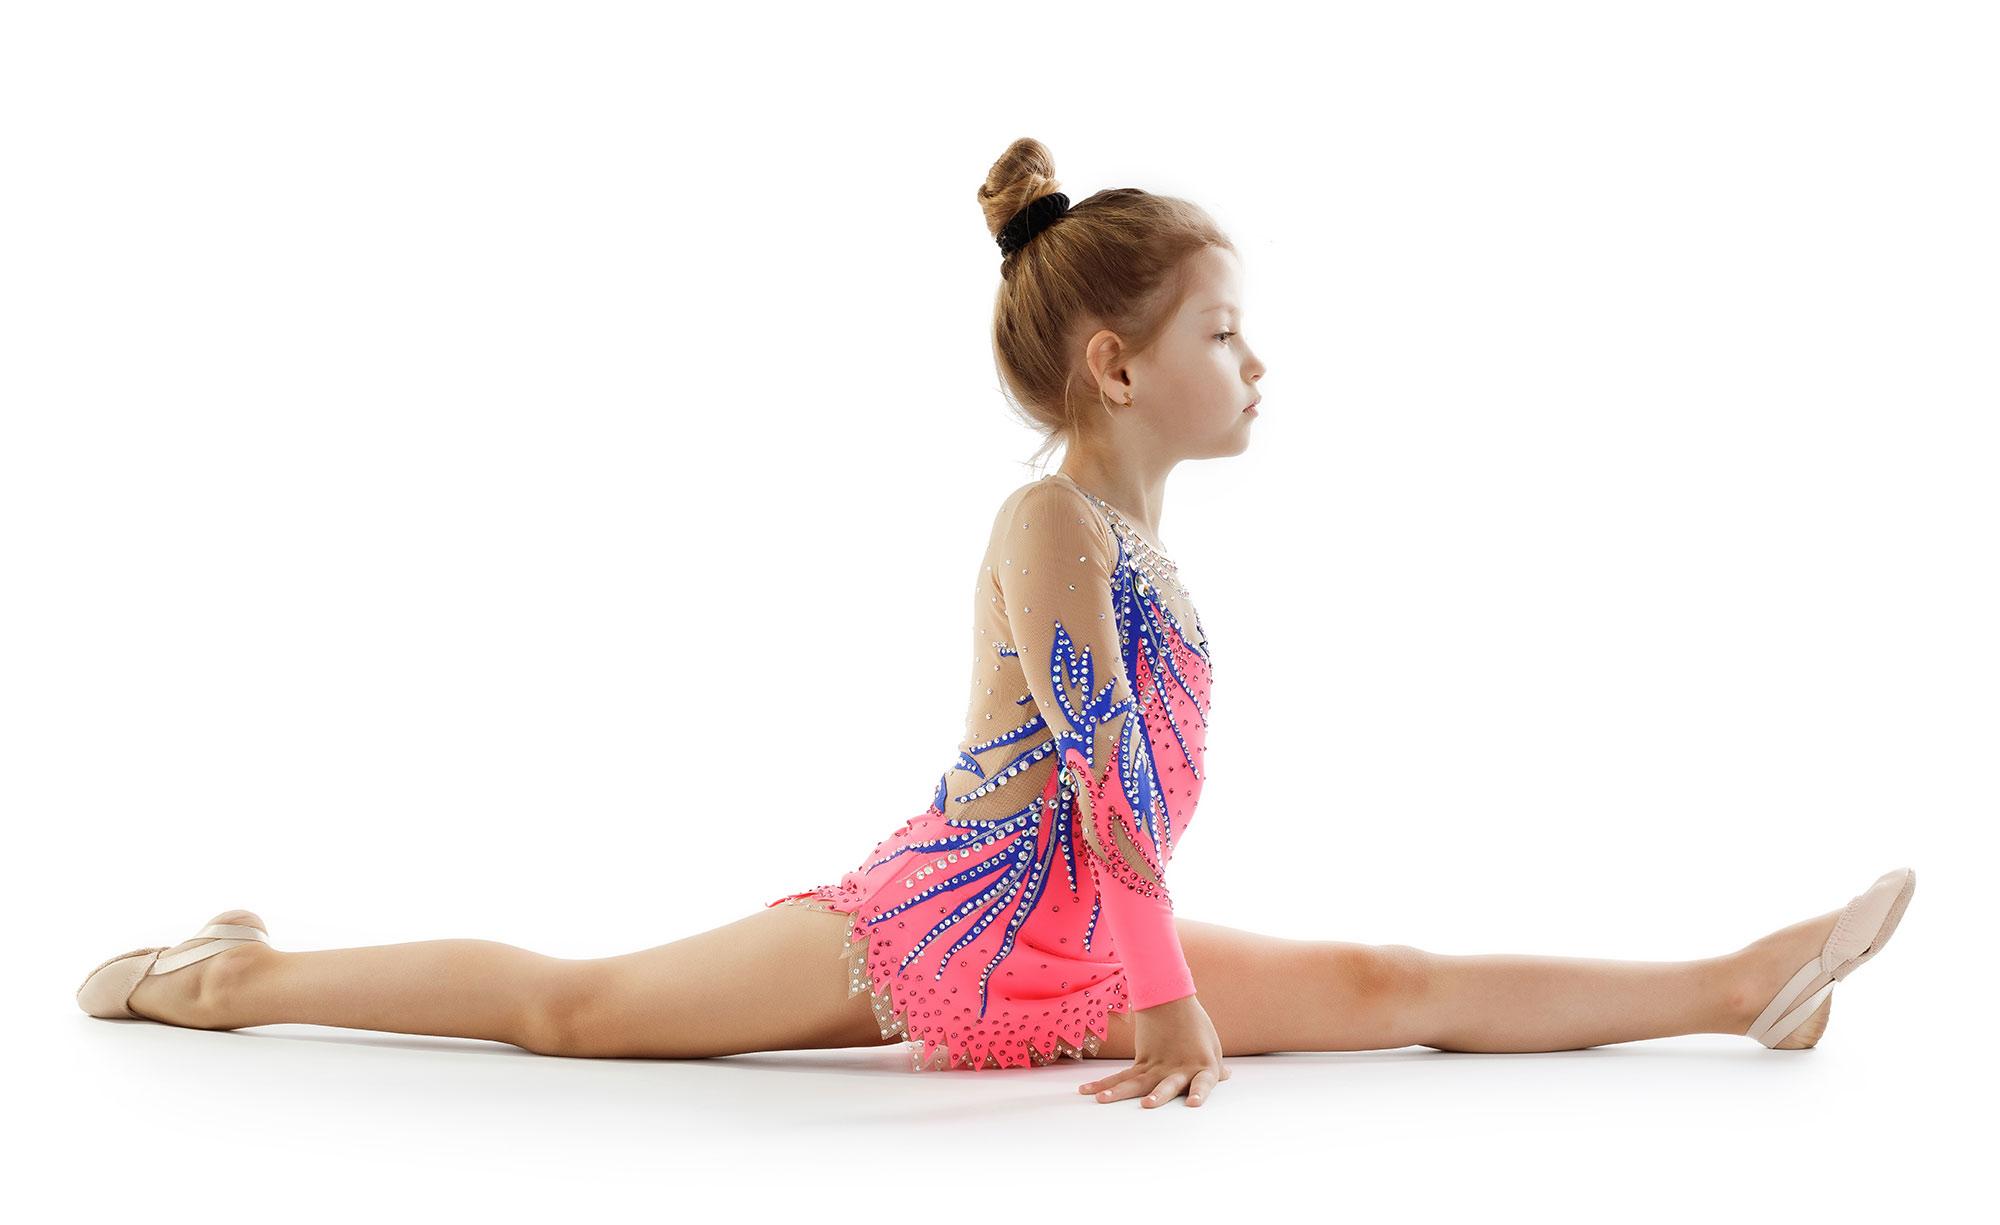 Rhythmic Gymnastics Leotard202 incoral, blue & mesh colors